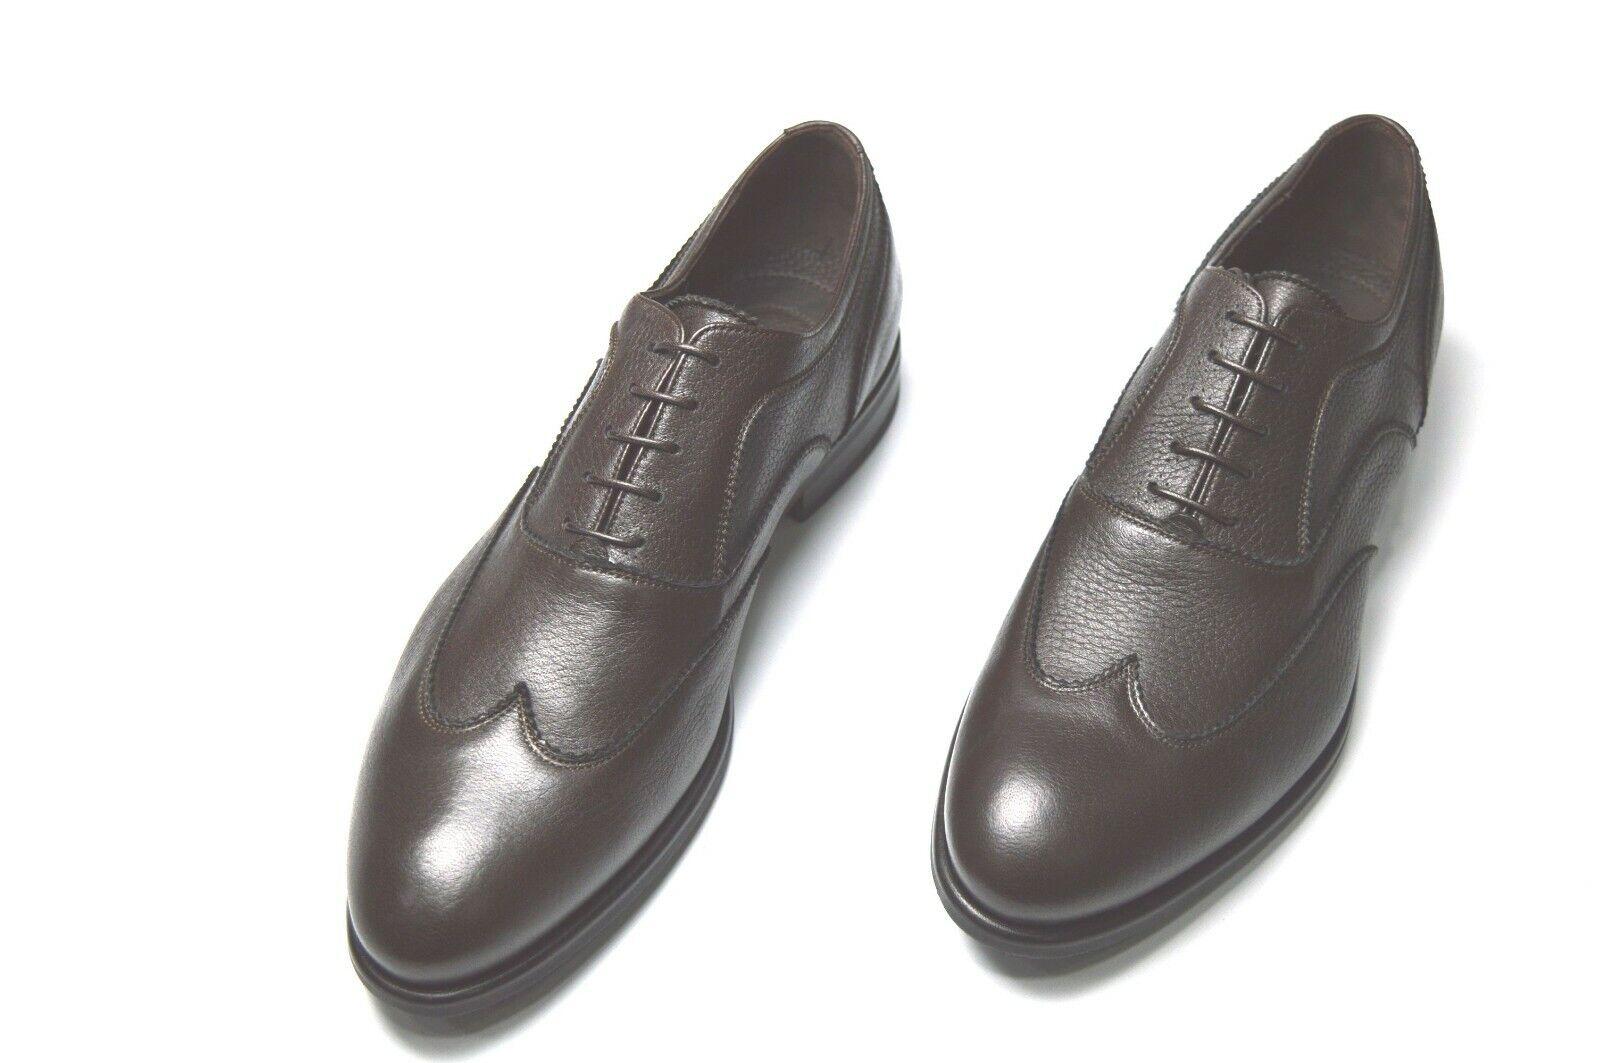 Nuevo STEFANO RICCI Luxury Zapatos Talla nos 11 (A456)